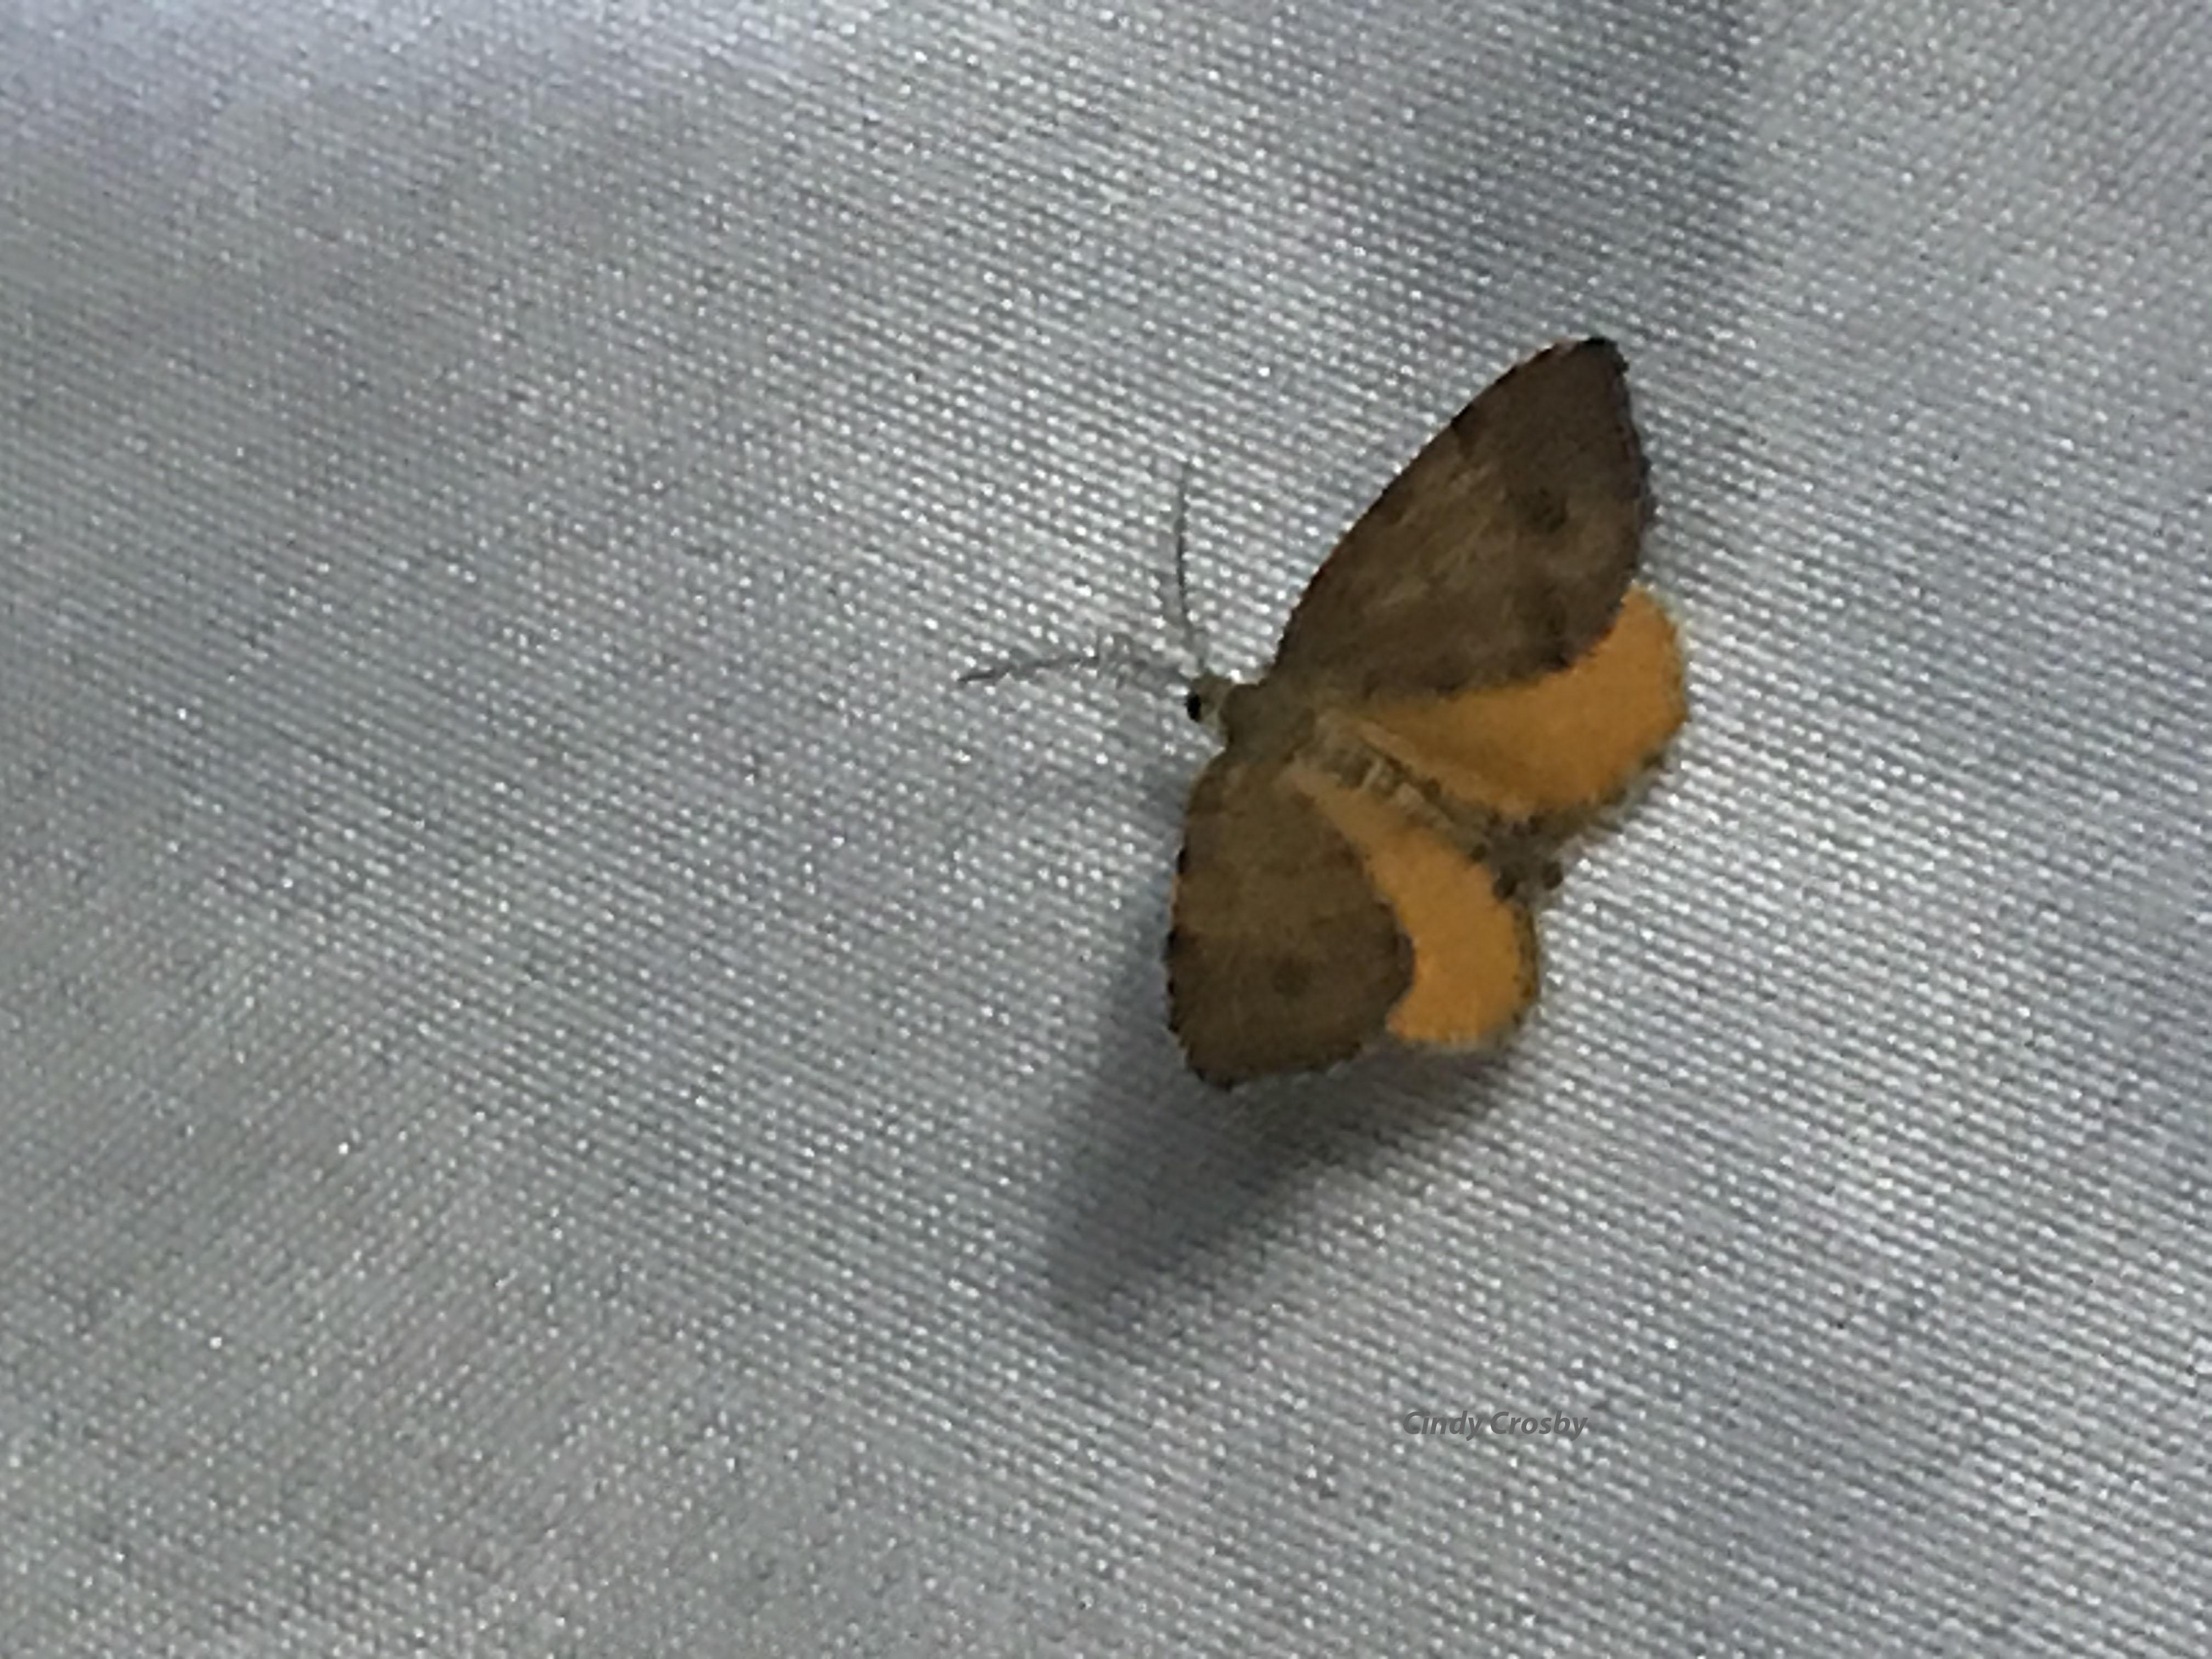 MothNightWMorangewing72520GEBackyard